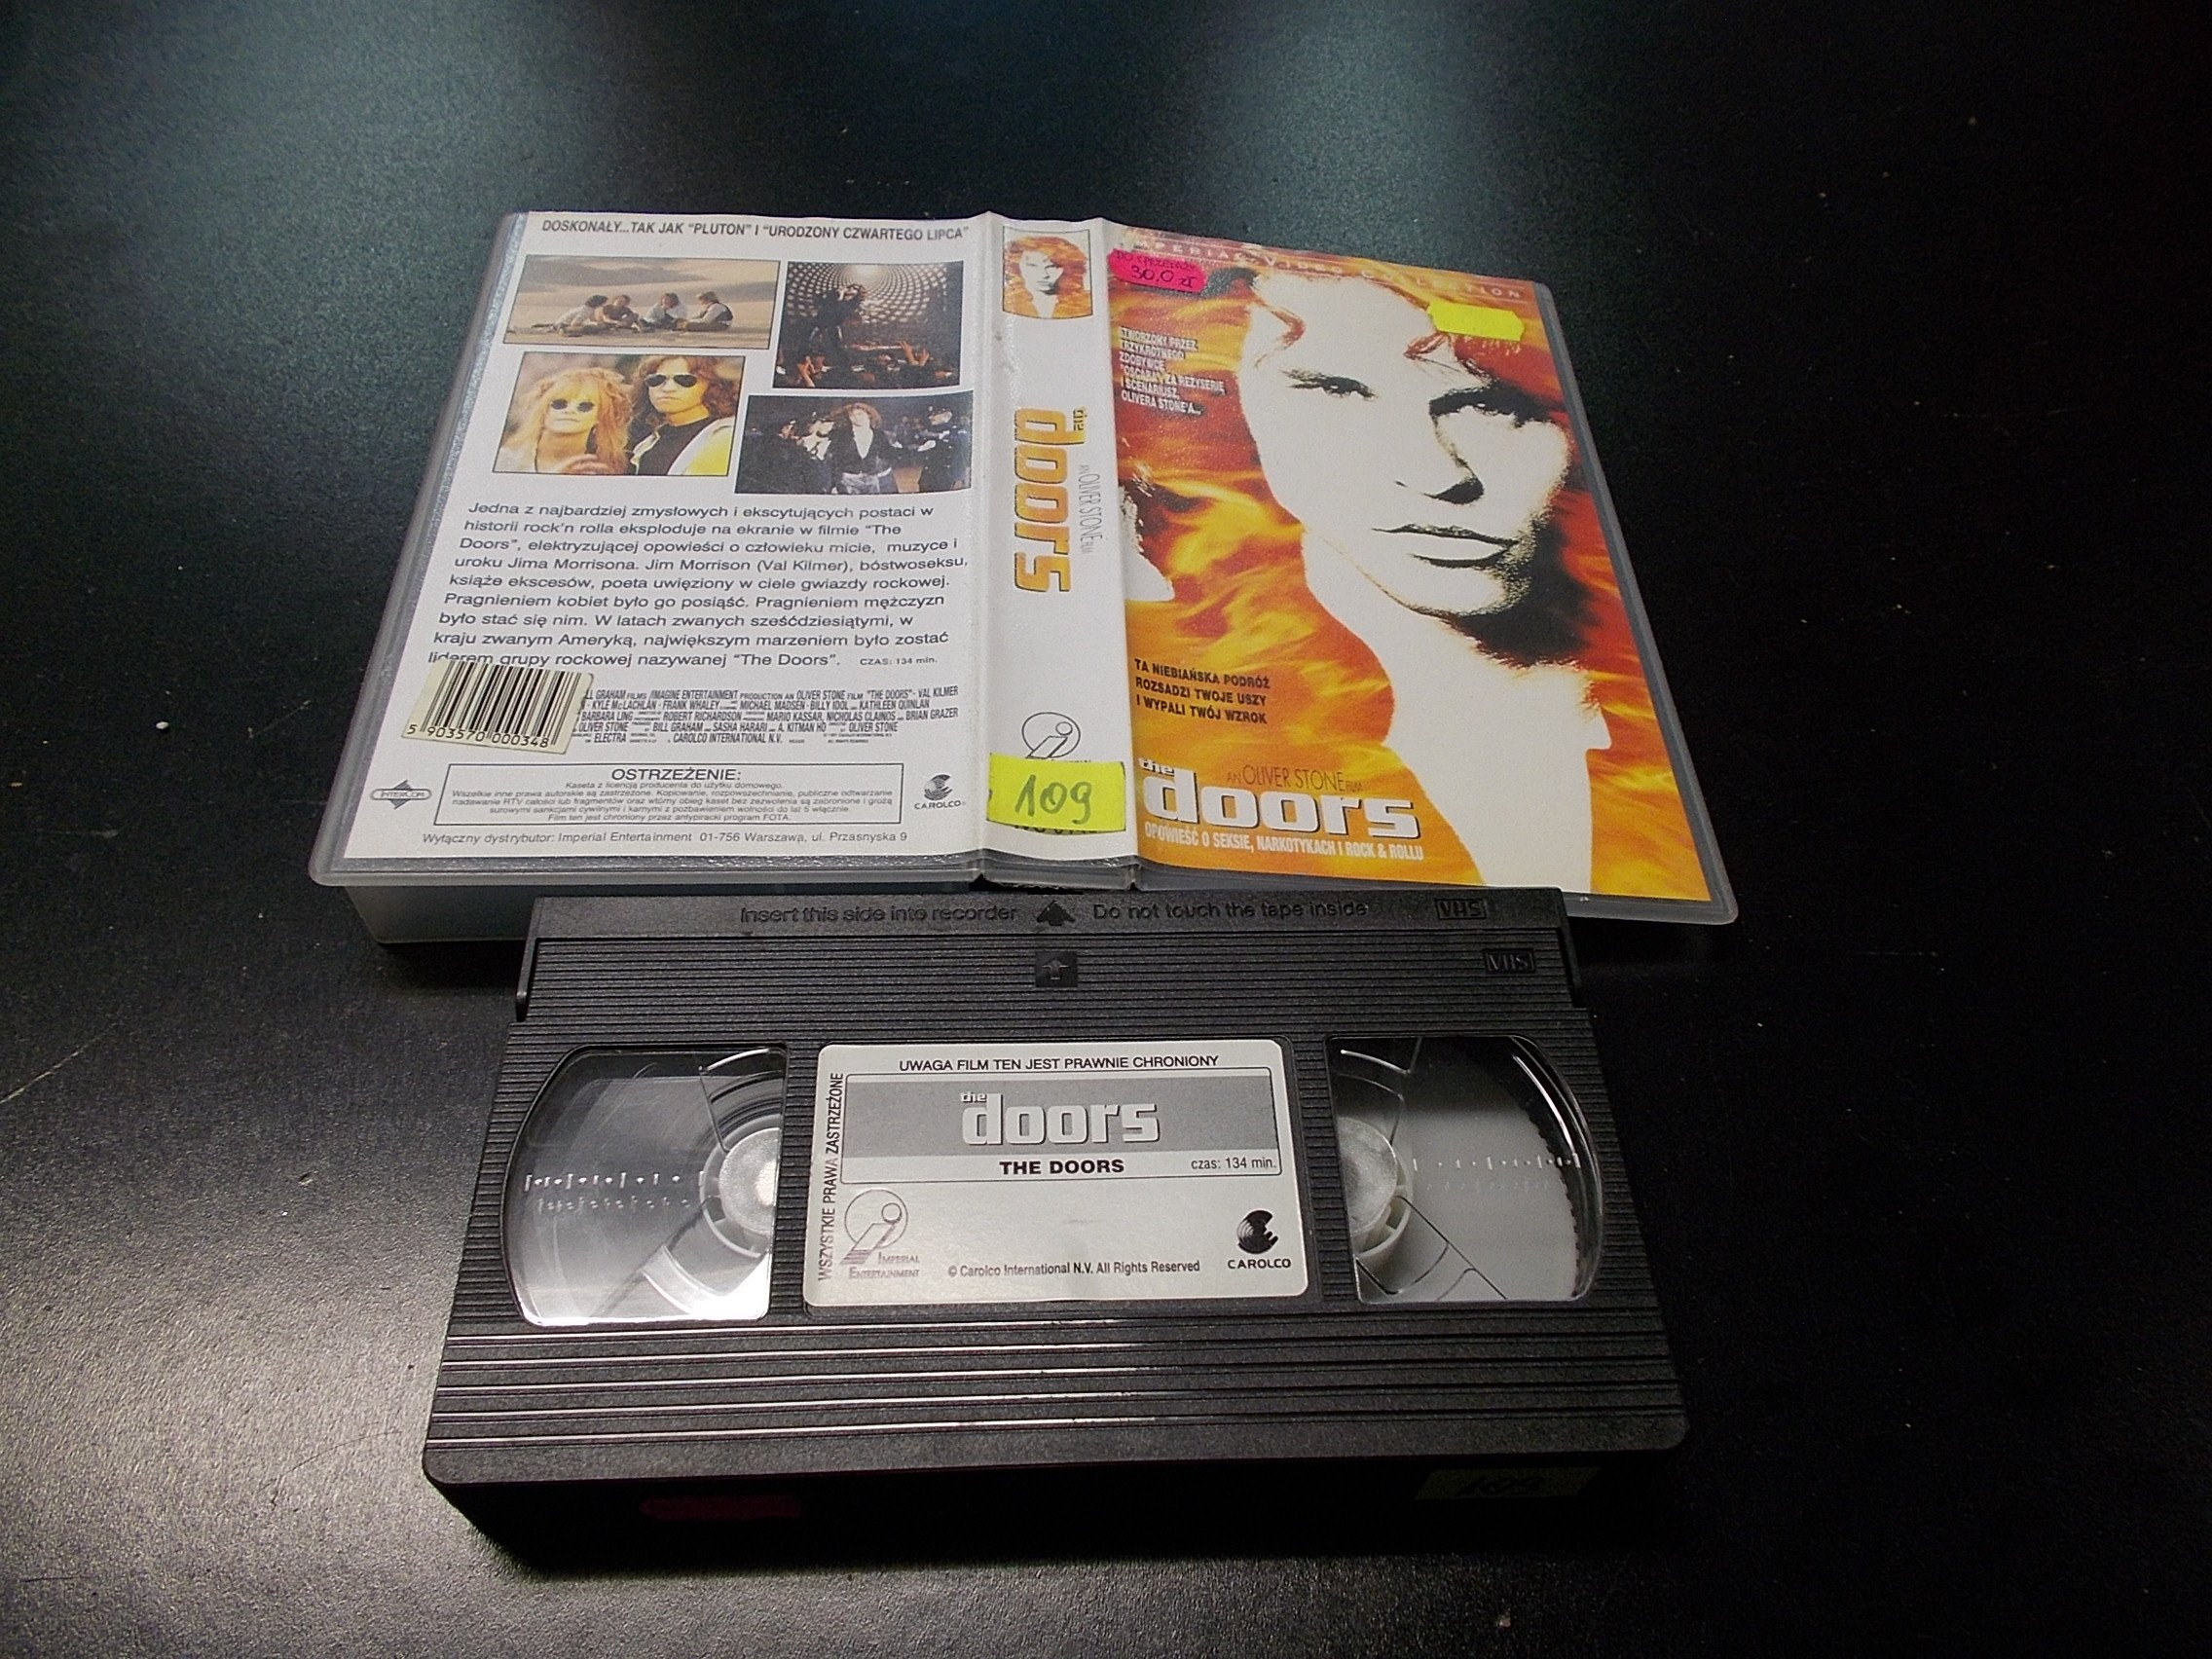 THE DOORS -  kaseta VHS - 1234 Opole - AlleOpole.pl